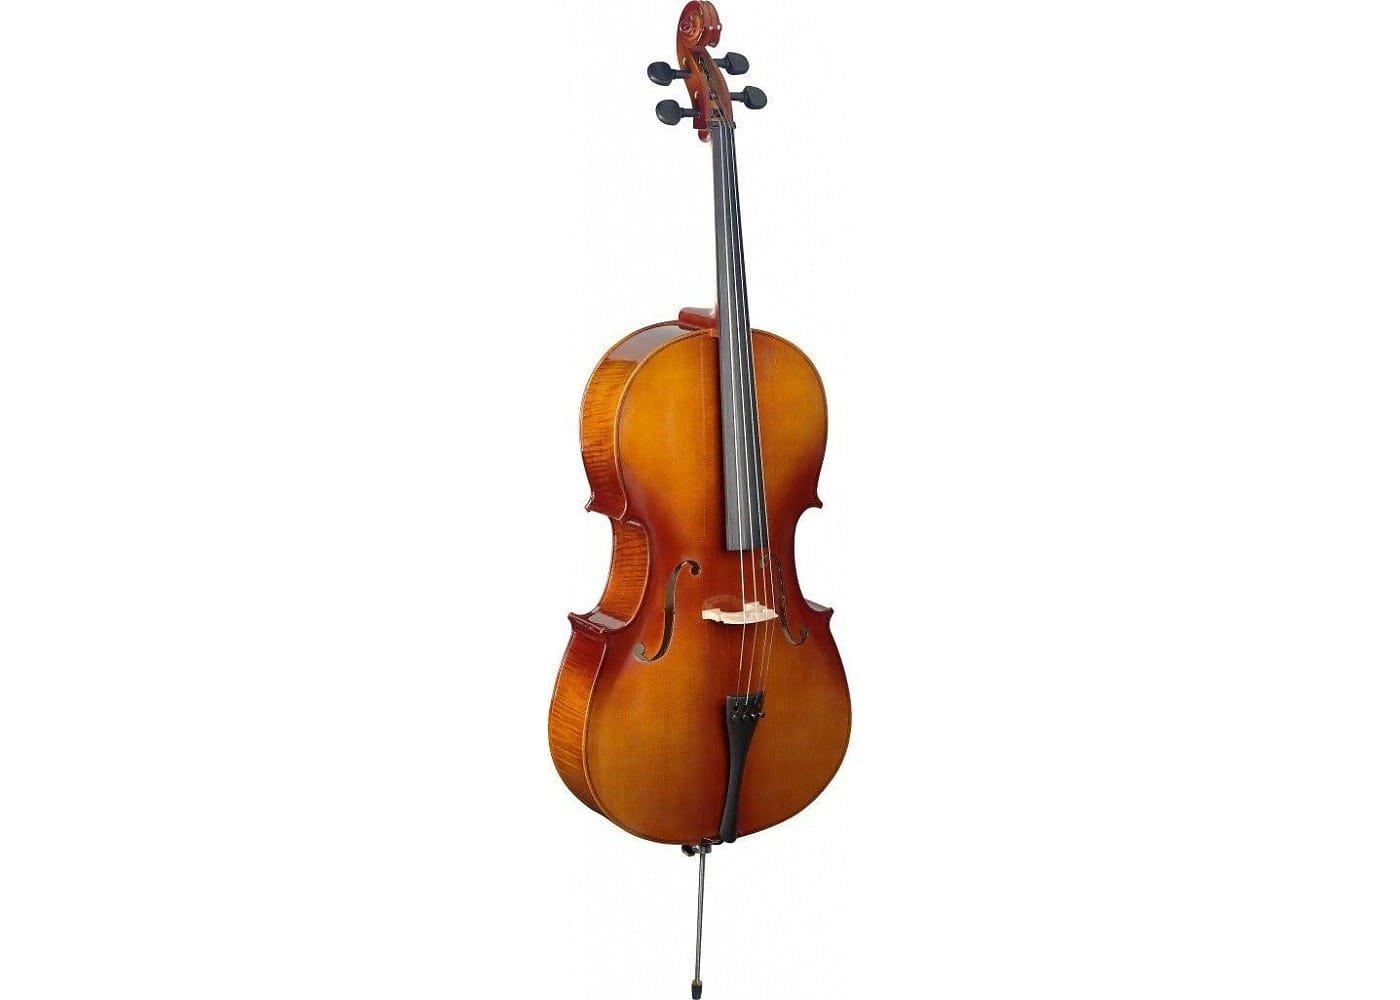 Capriccio 150SHC12 1/2 Cello